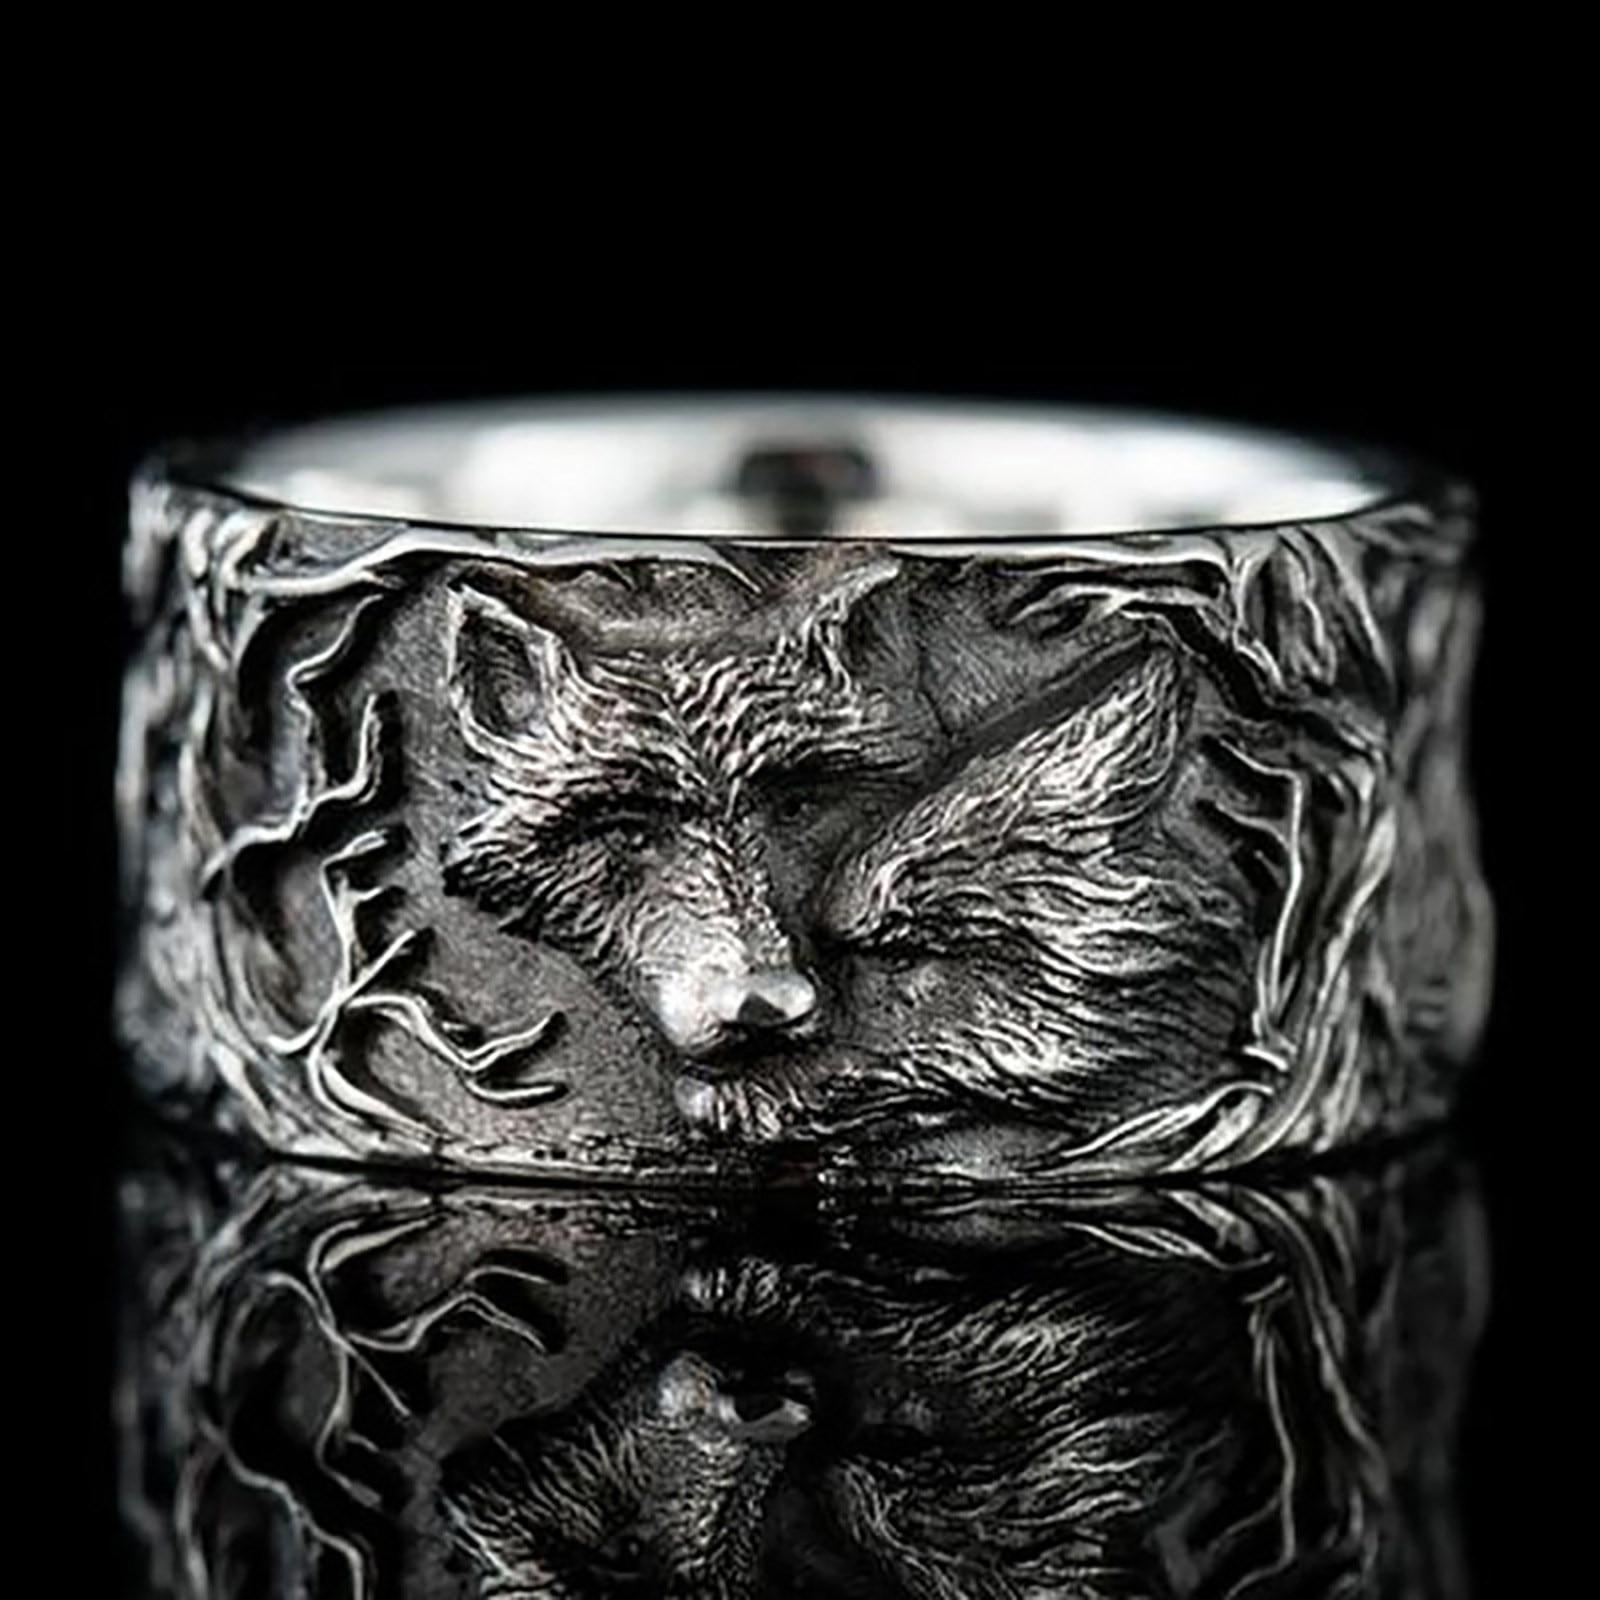 Mode rétro Stijl Wolf Patroon Legering Ringen Voor Mannen En Vrouwen Universele anneau à la main